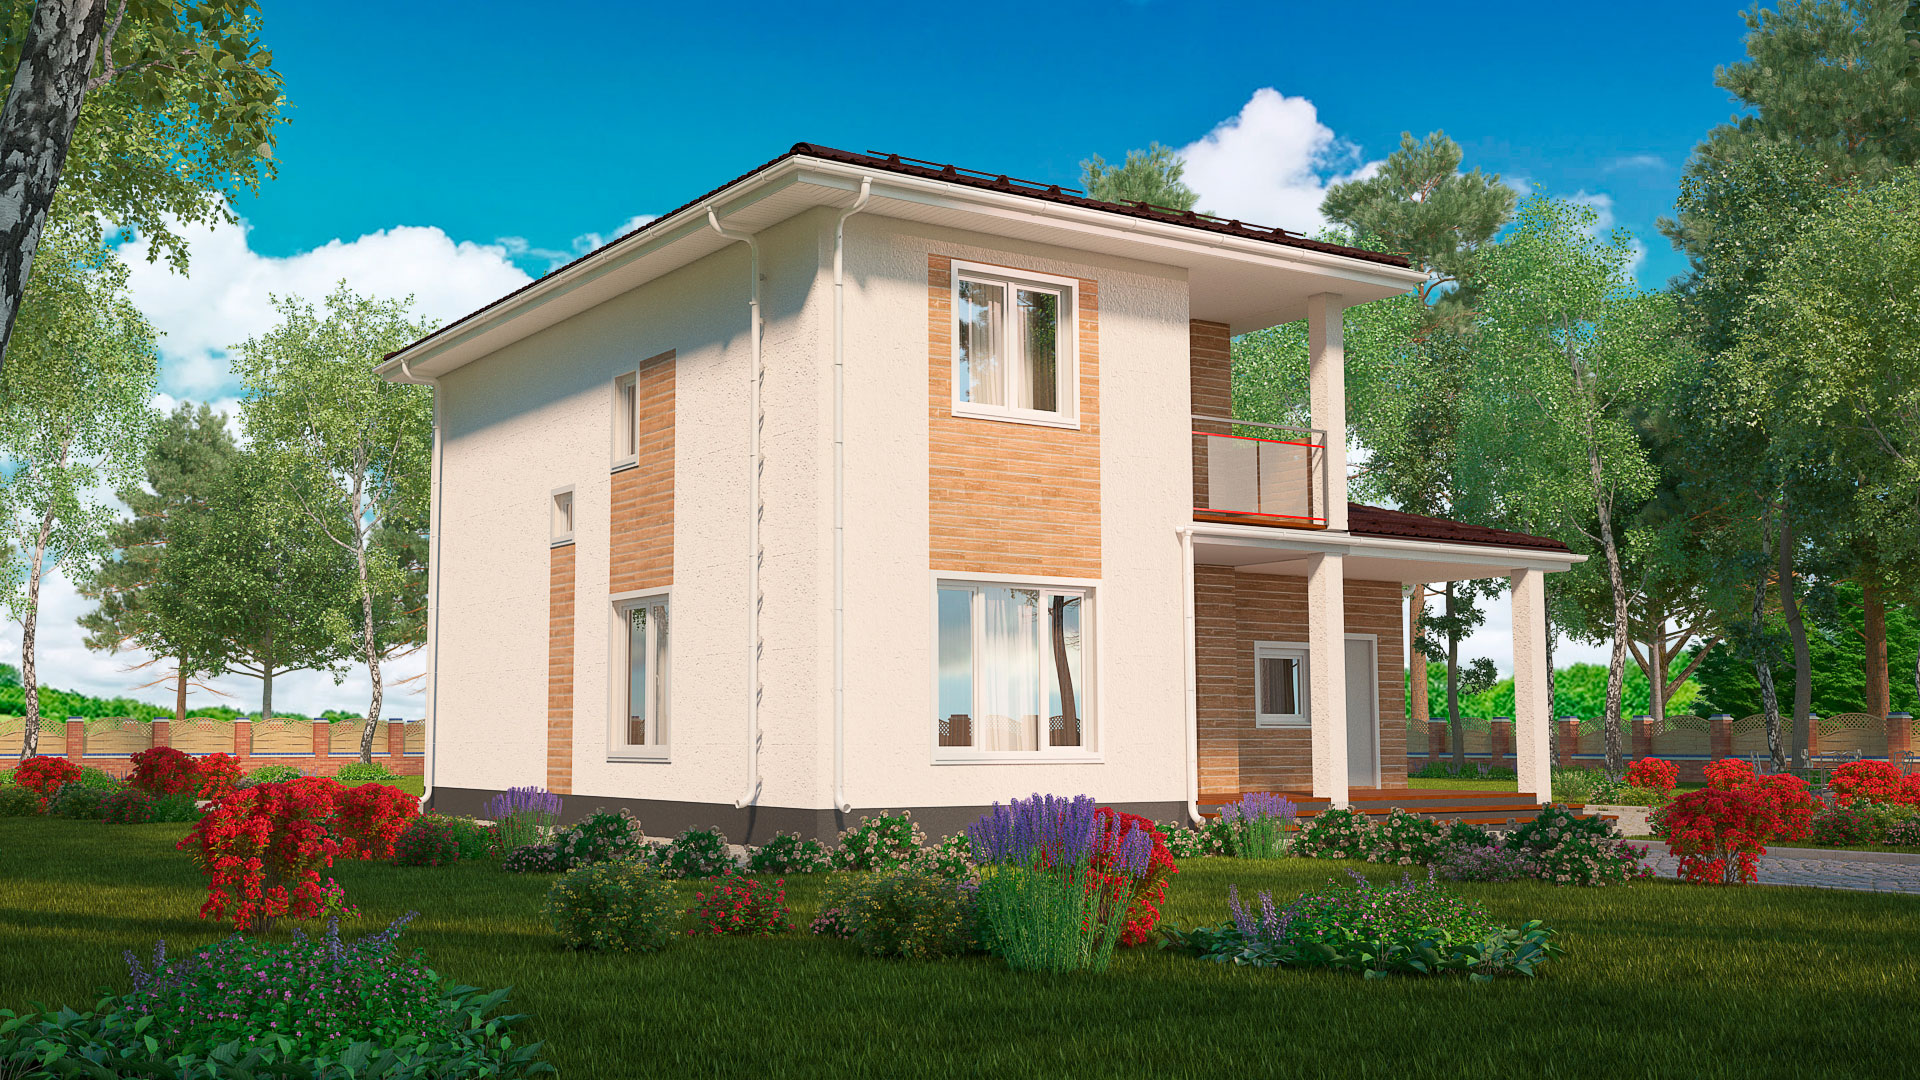 Задний фасад дома 11 на 11 двухэтажного. Проект БЭНПАН МС-191.